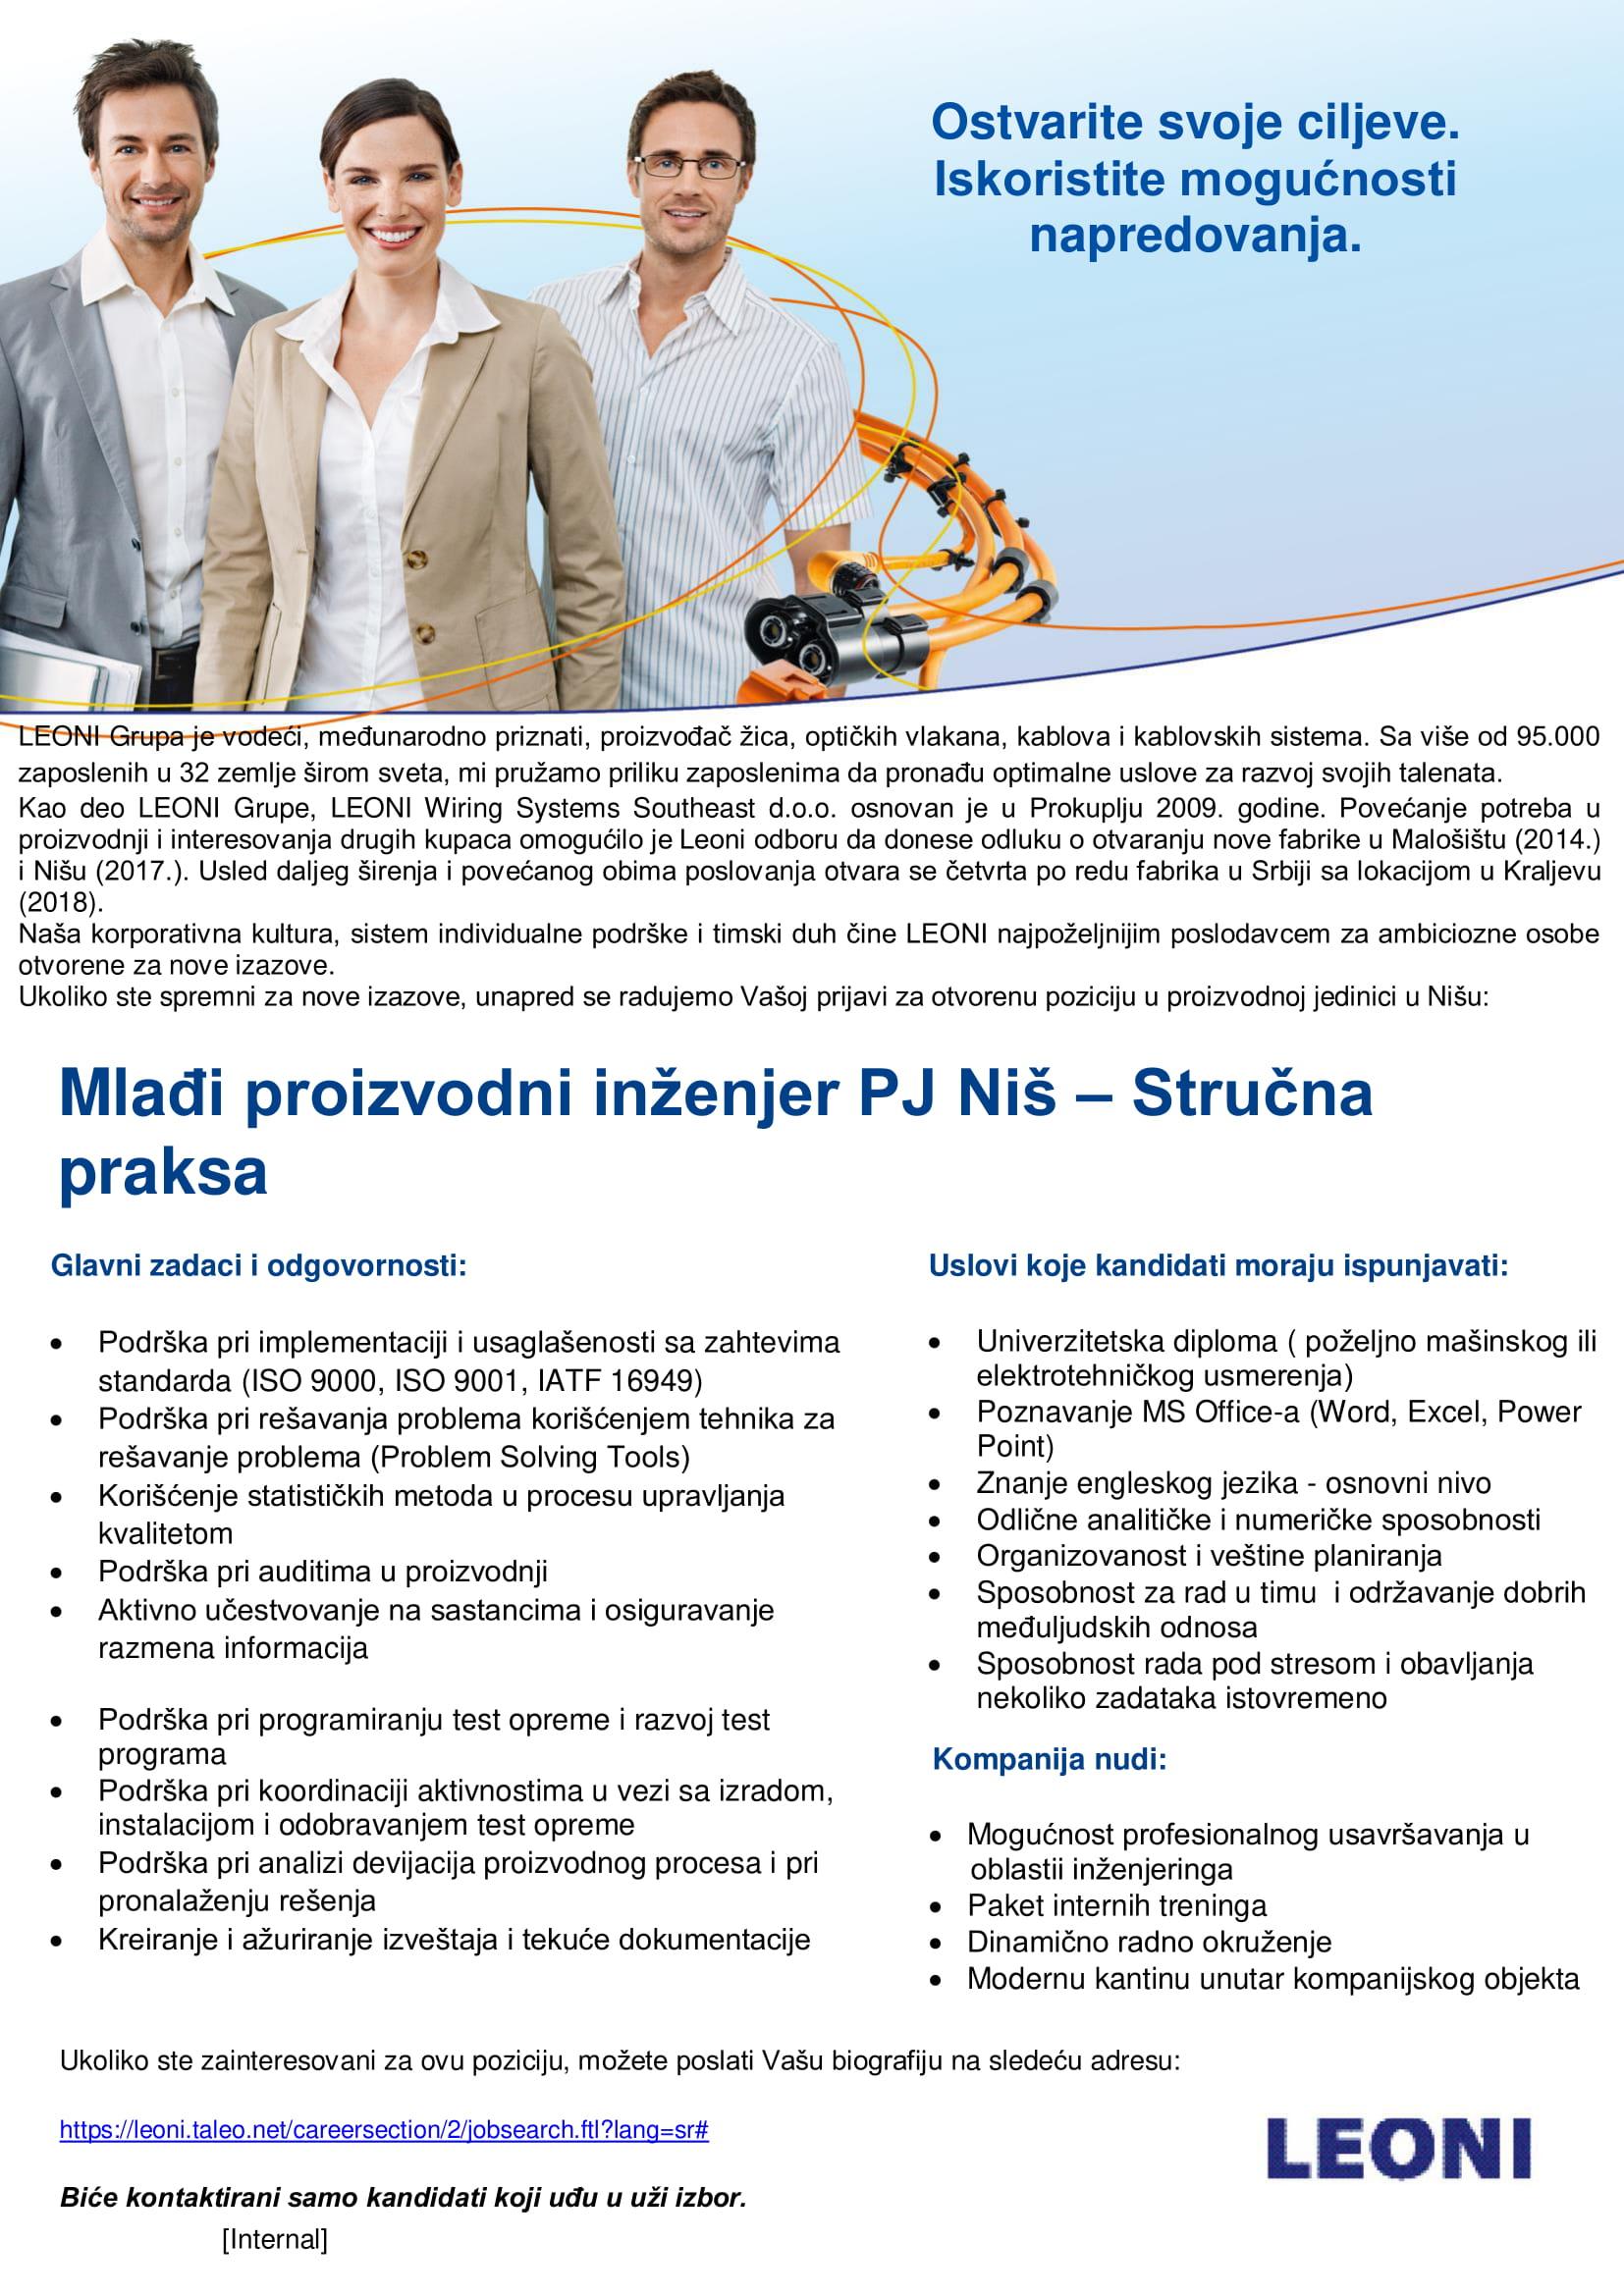 Mlađi proizvodni inženjer PJ Niš – Stručna praksa